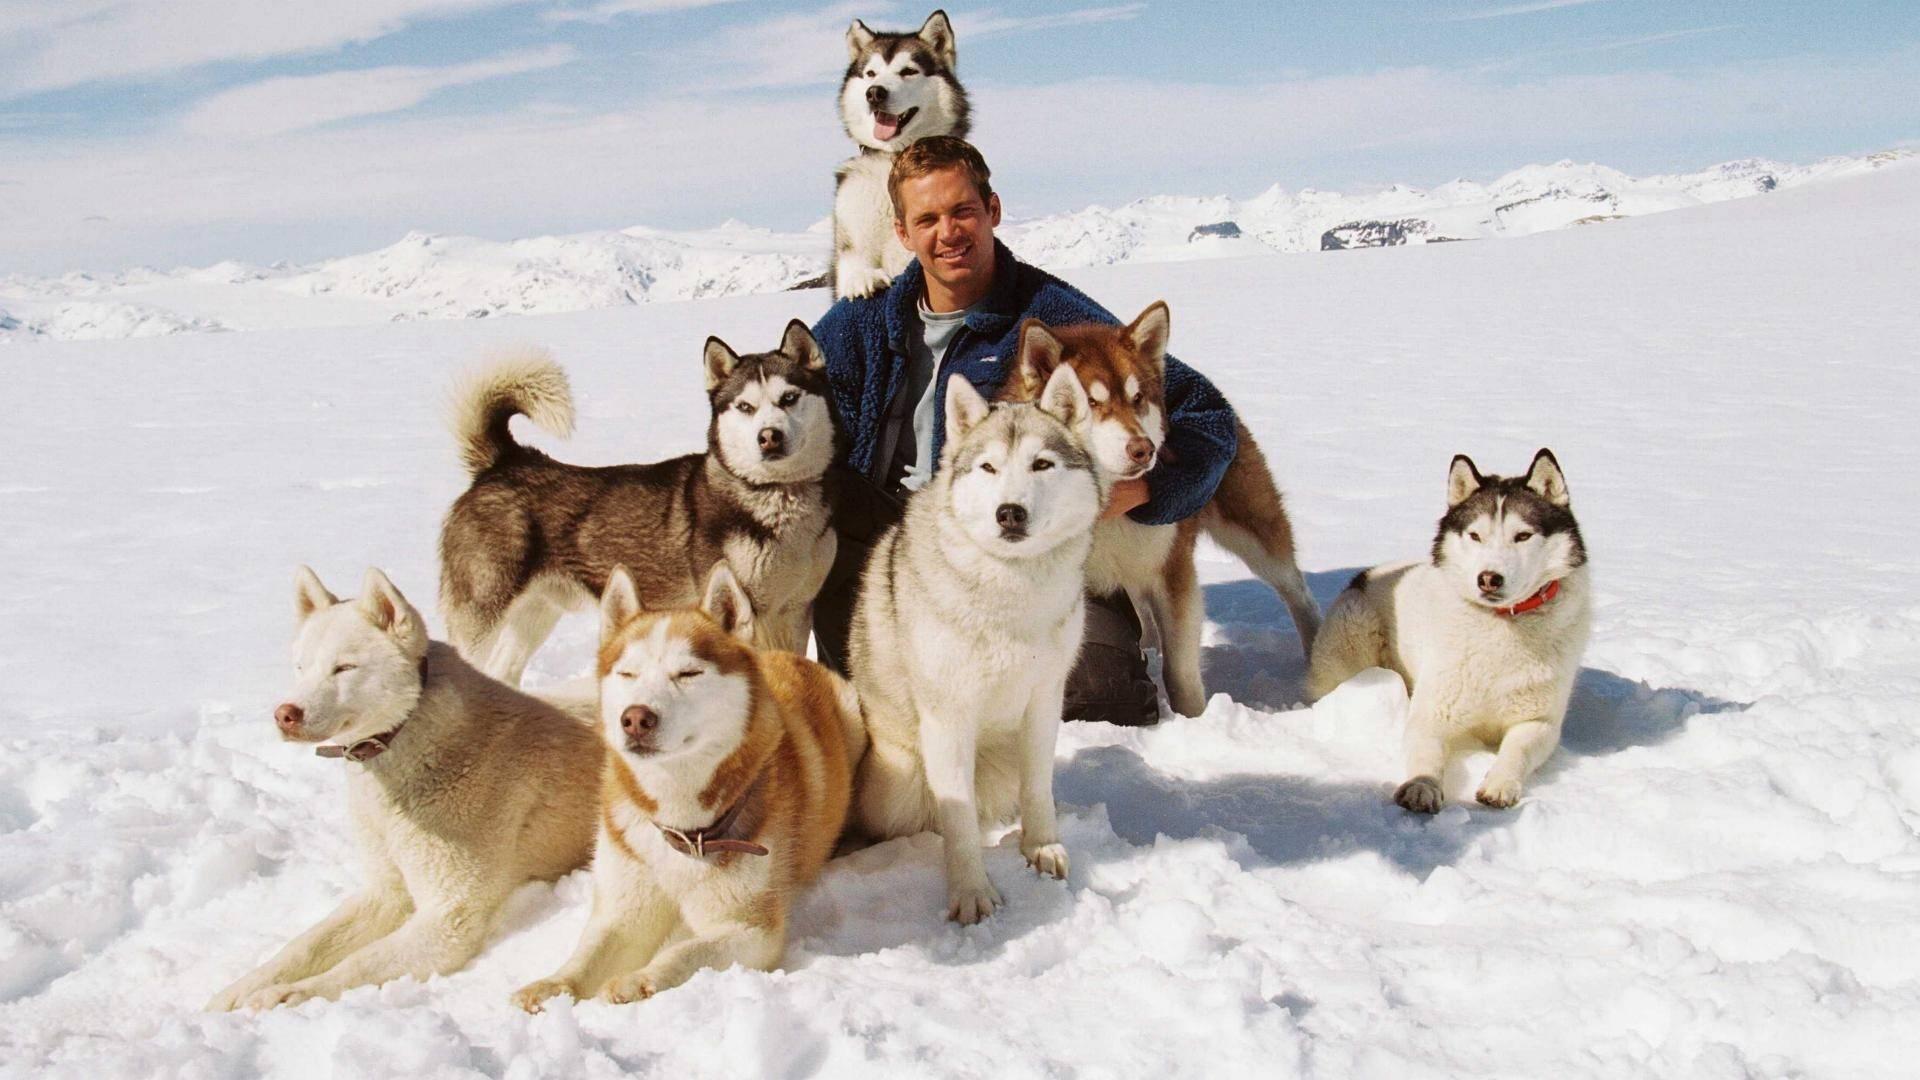 обои Хаски, собаки, Пол Уокер, сугробы картинки фото